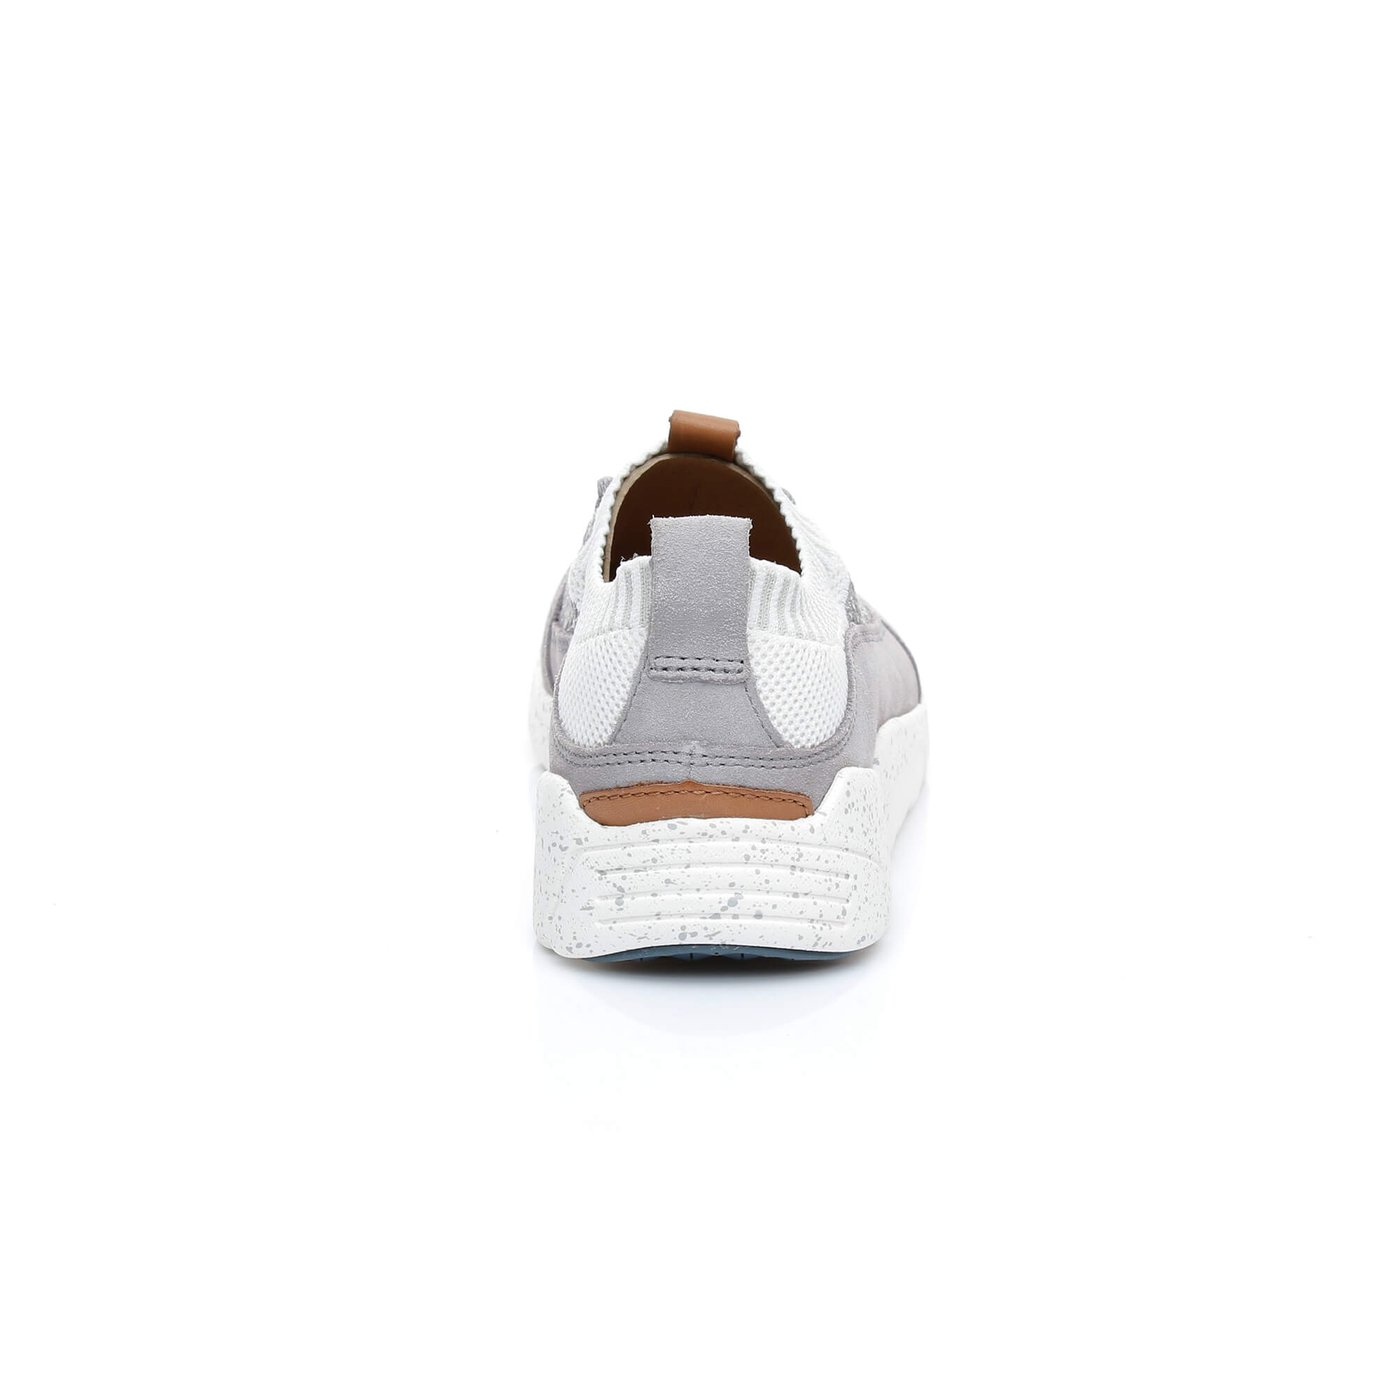 Clarks Triactive Knit Erkek Gri Sneakers